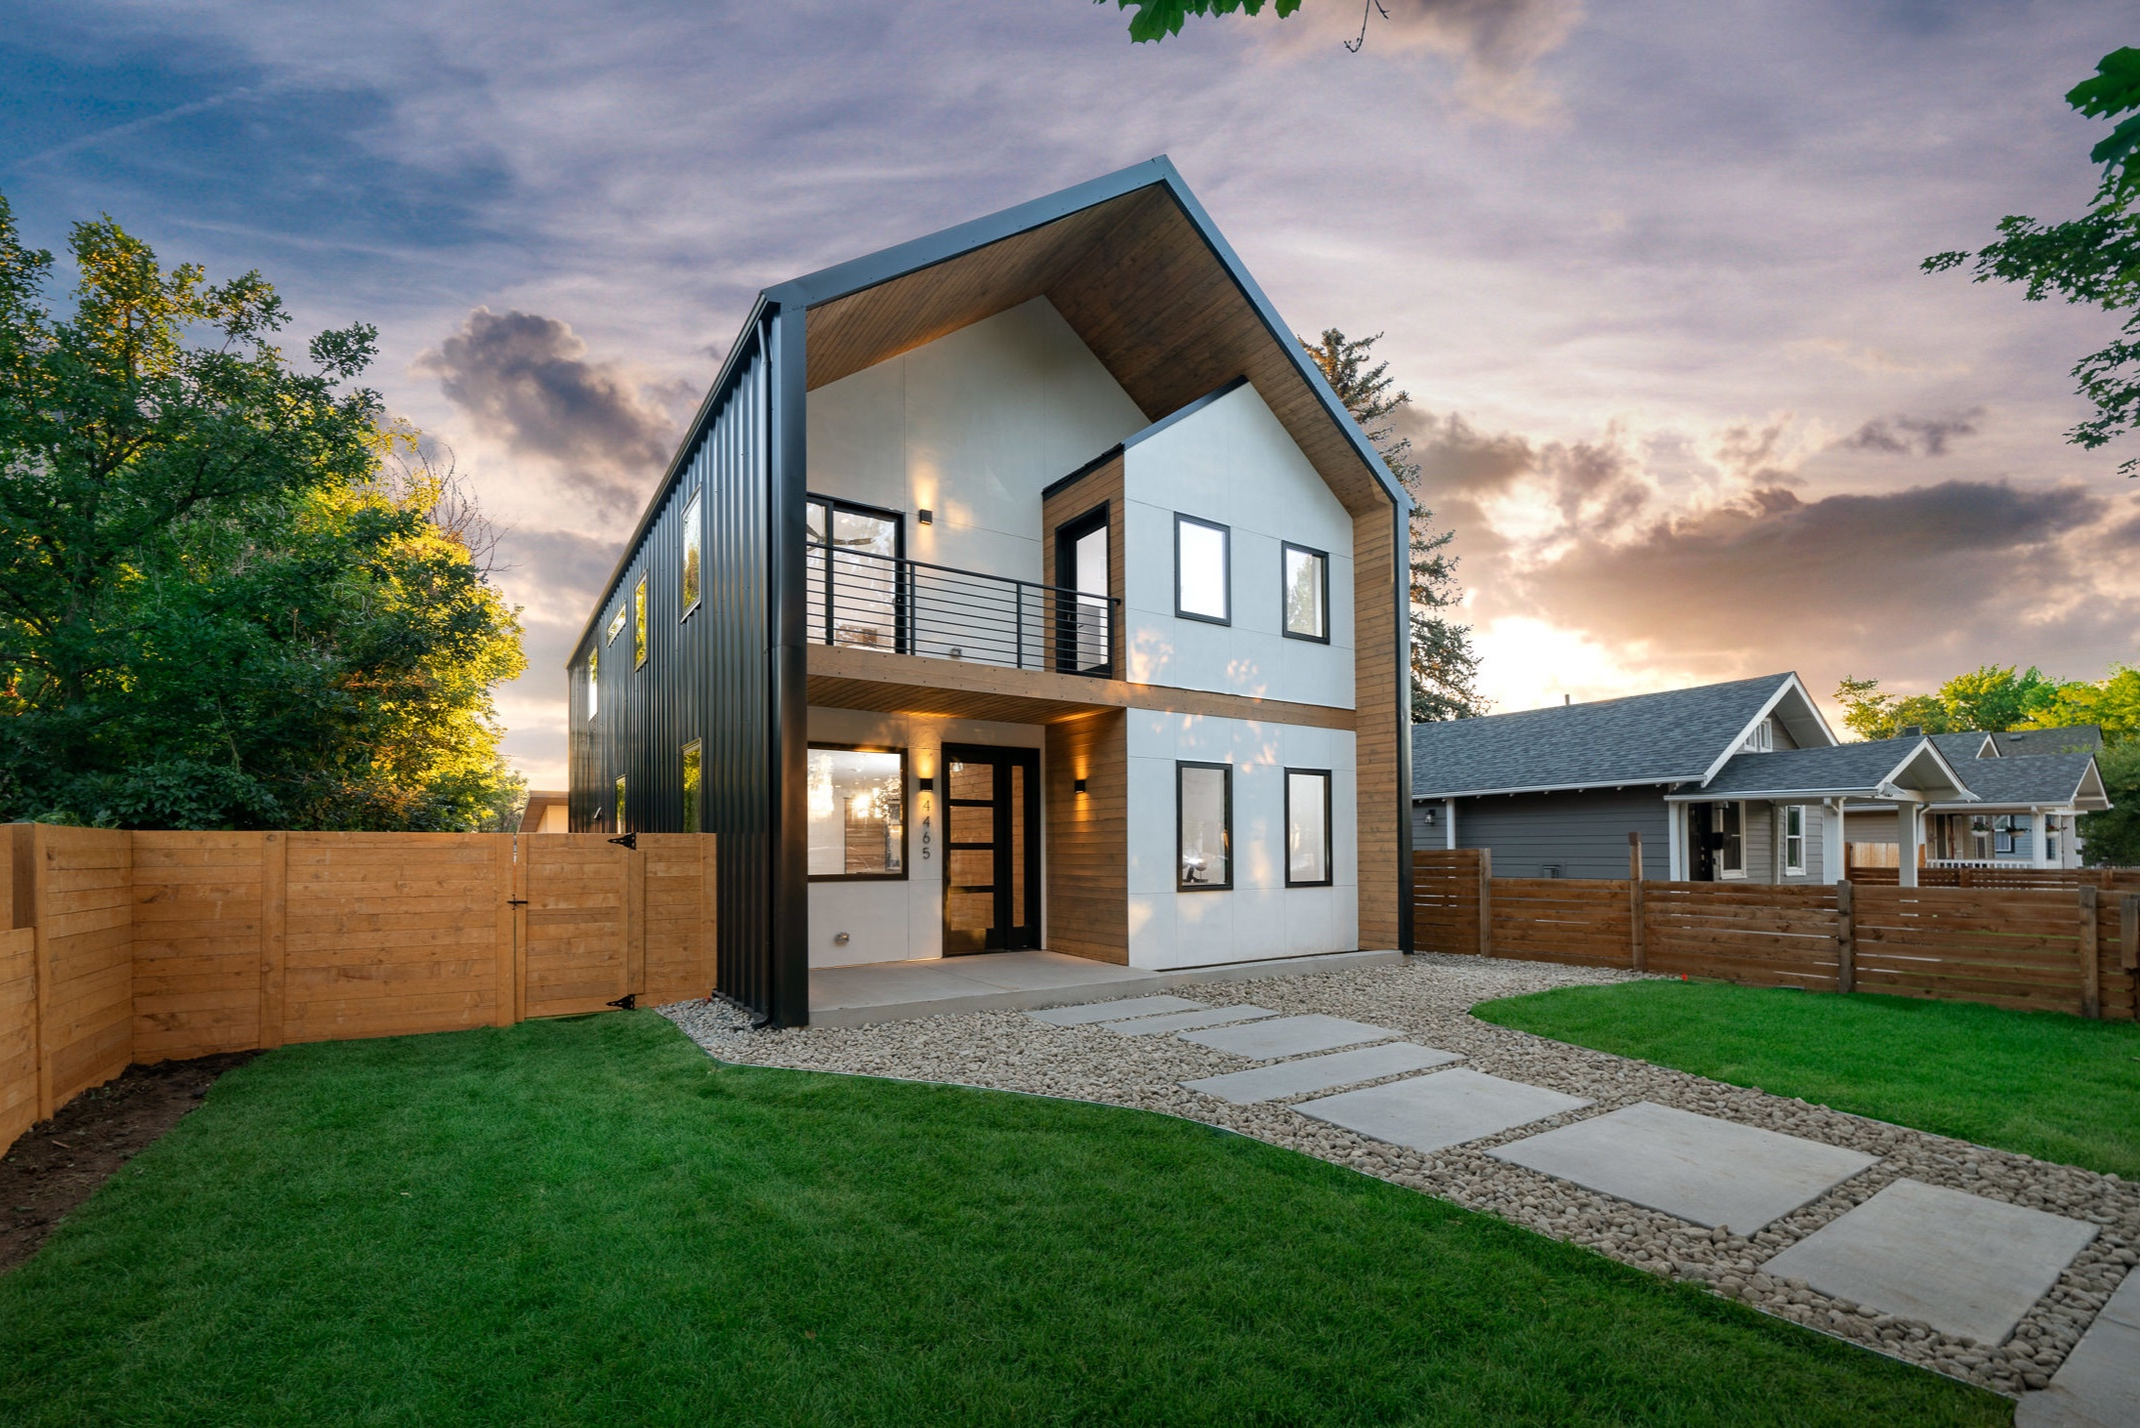 Denver Mod Haus - - view -